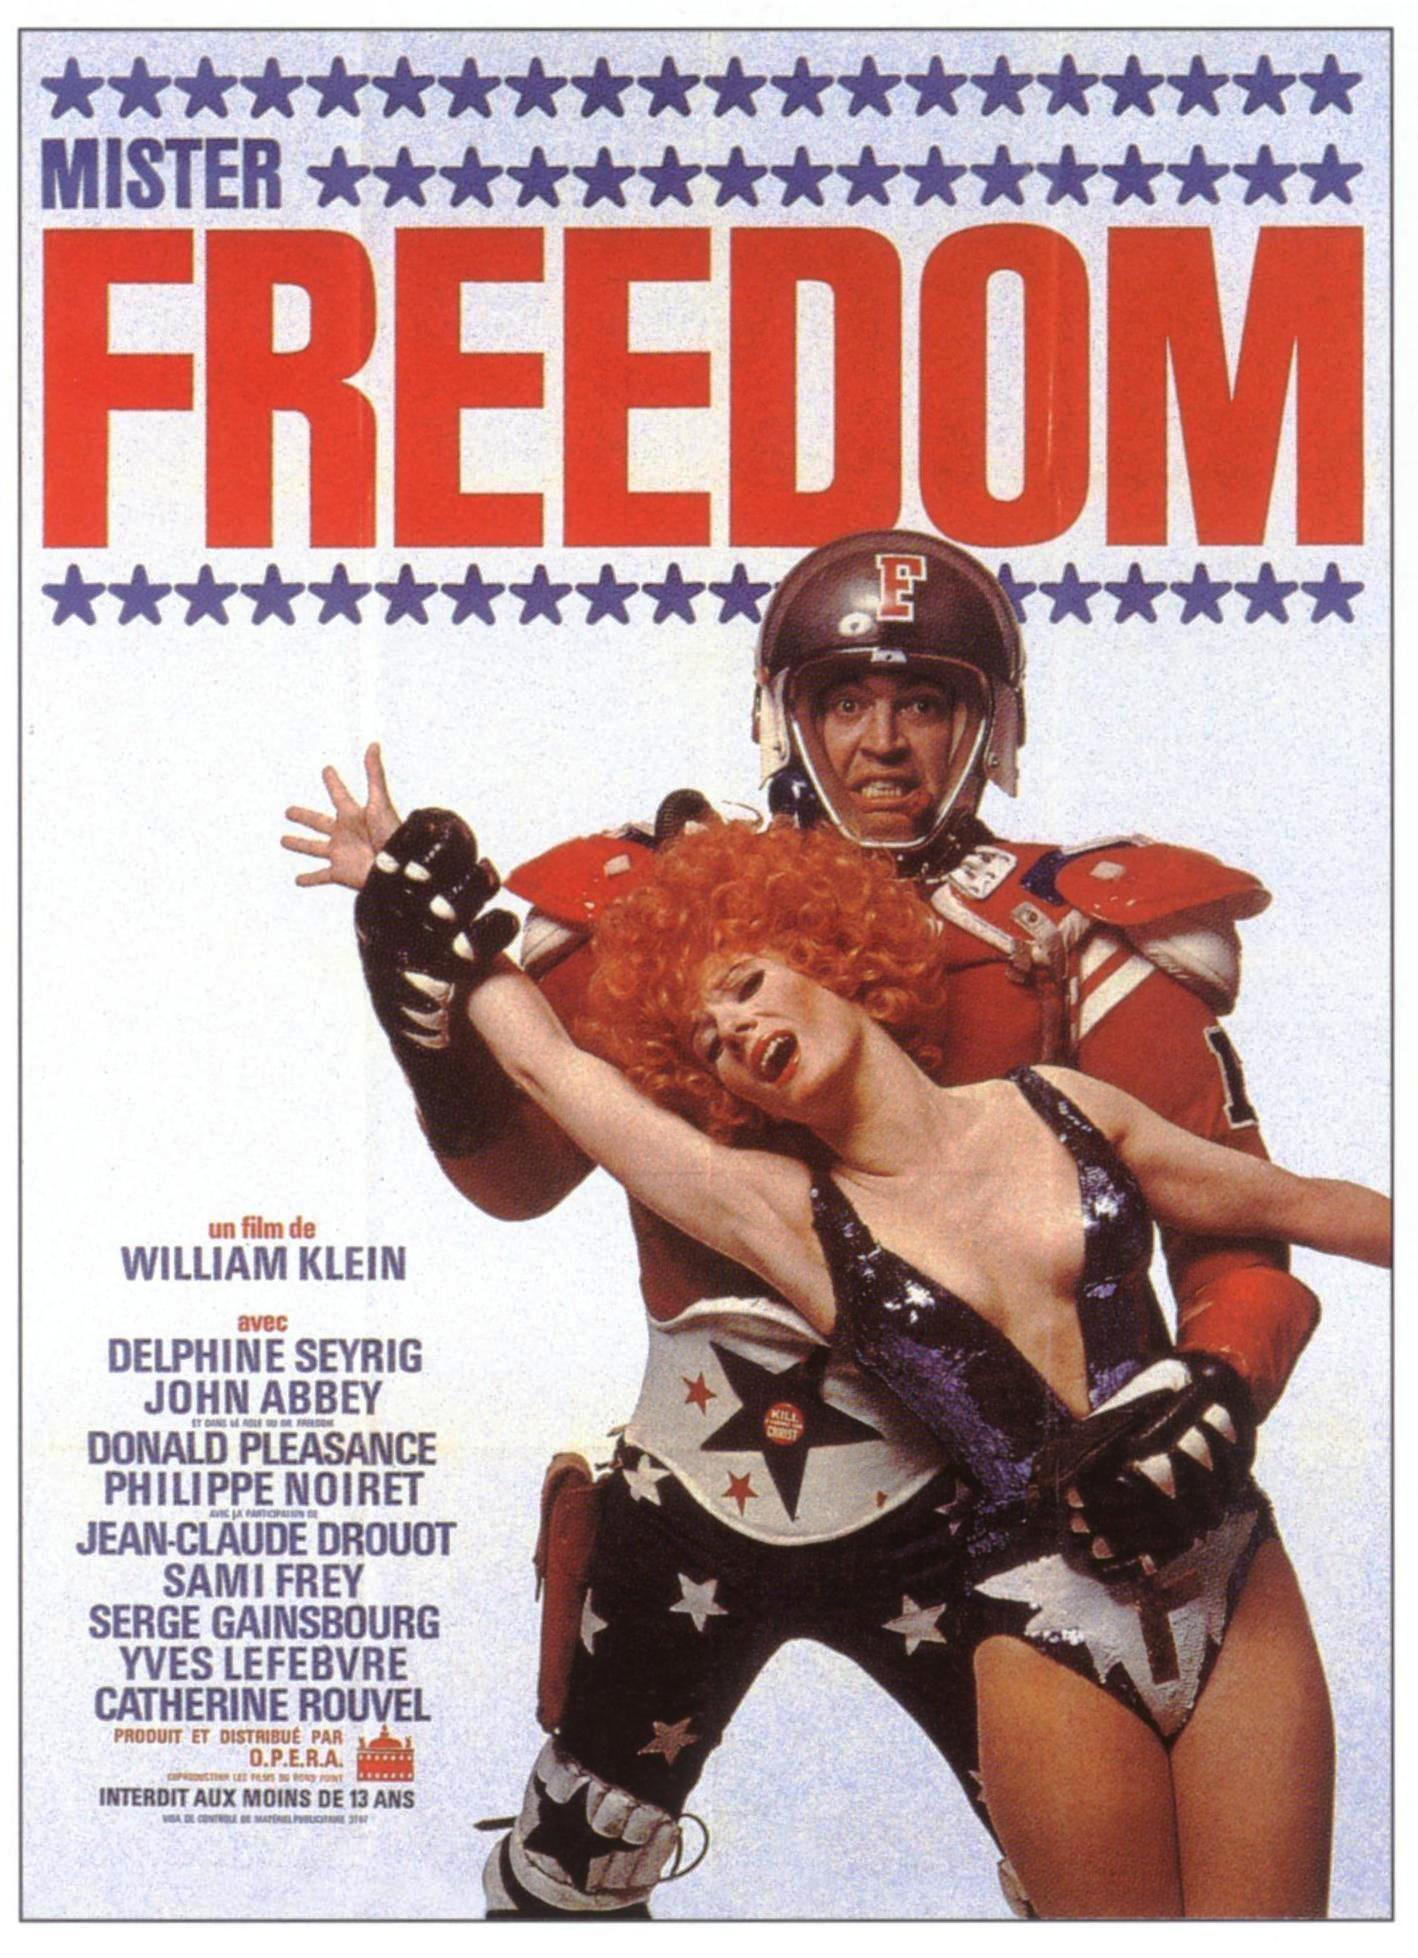 mister_freedom_poster